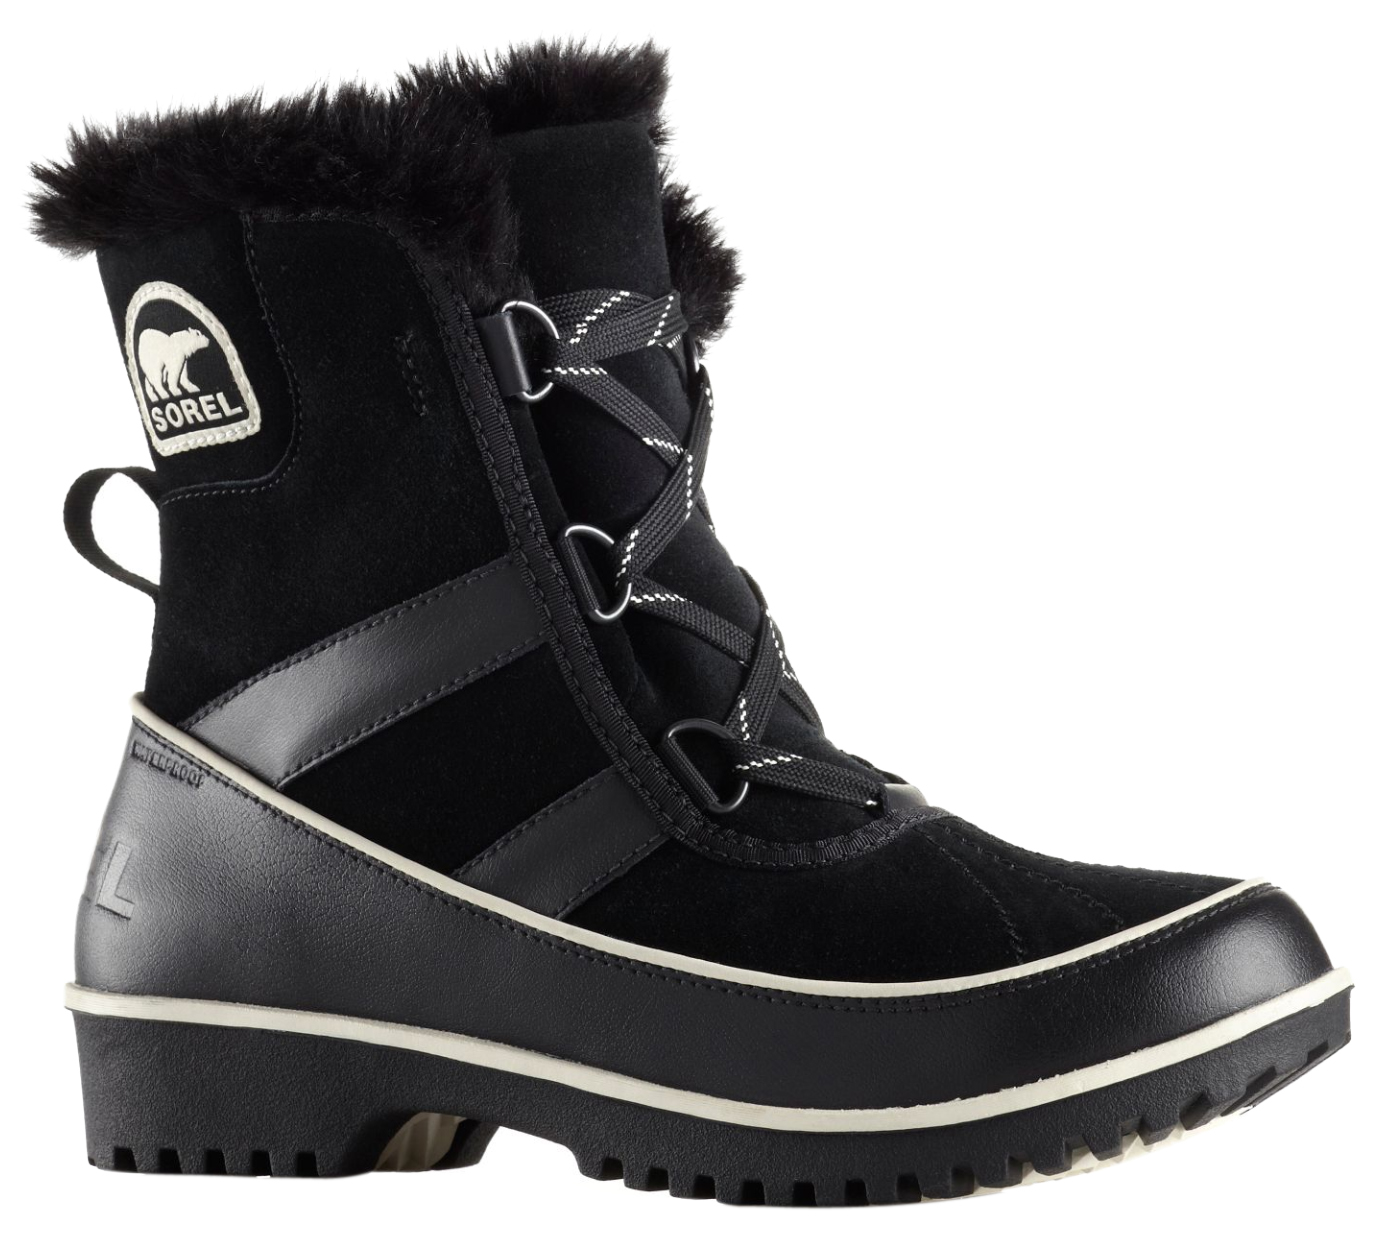 Sorel Tivoli II Boots - Women's   MEC